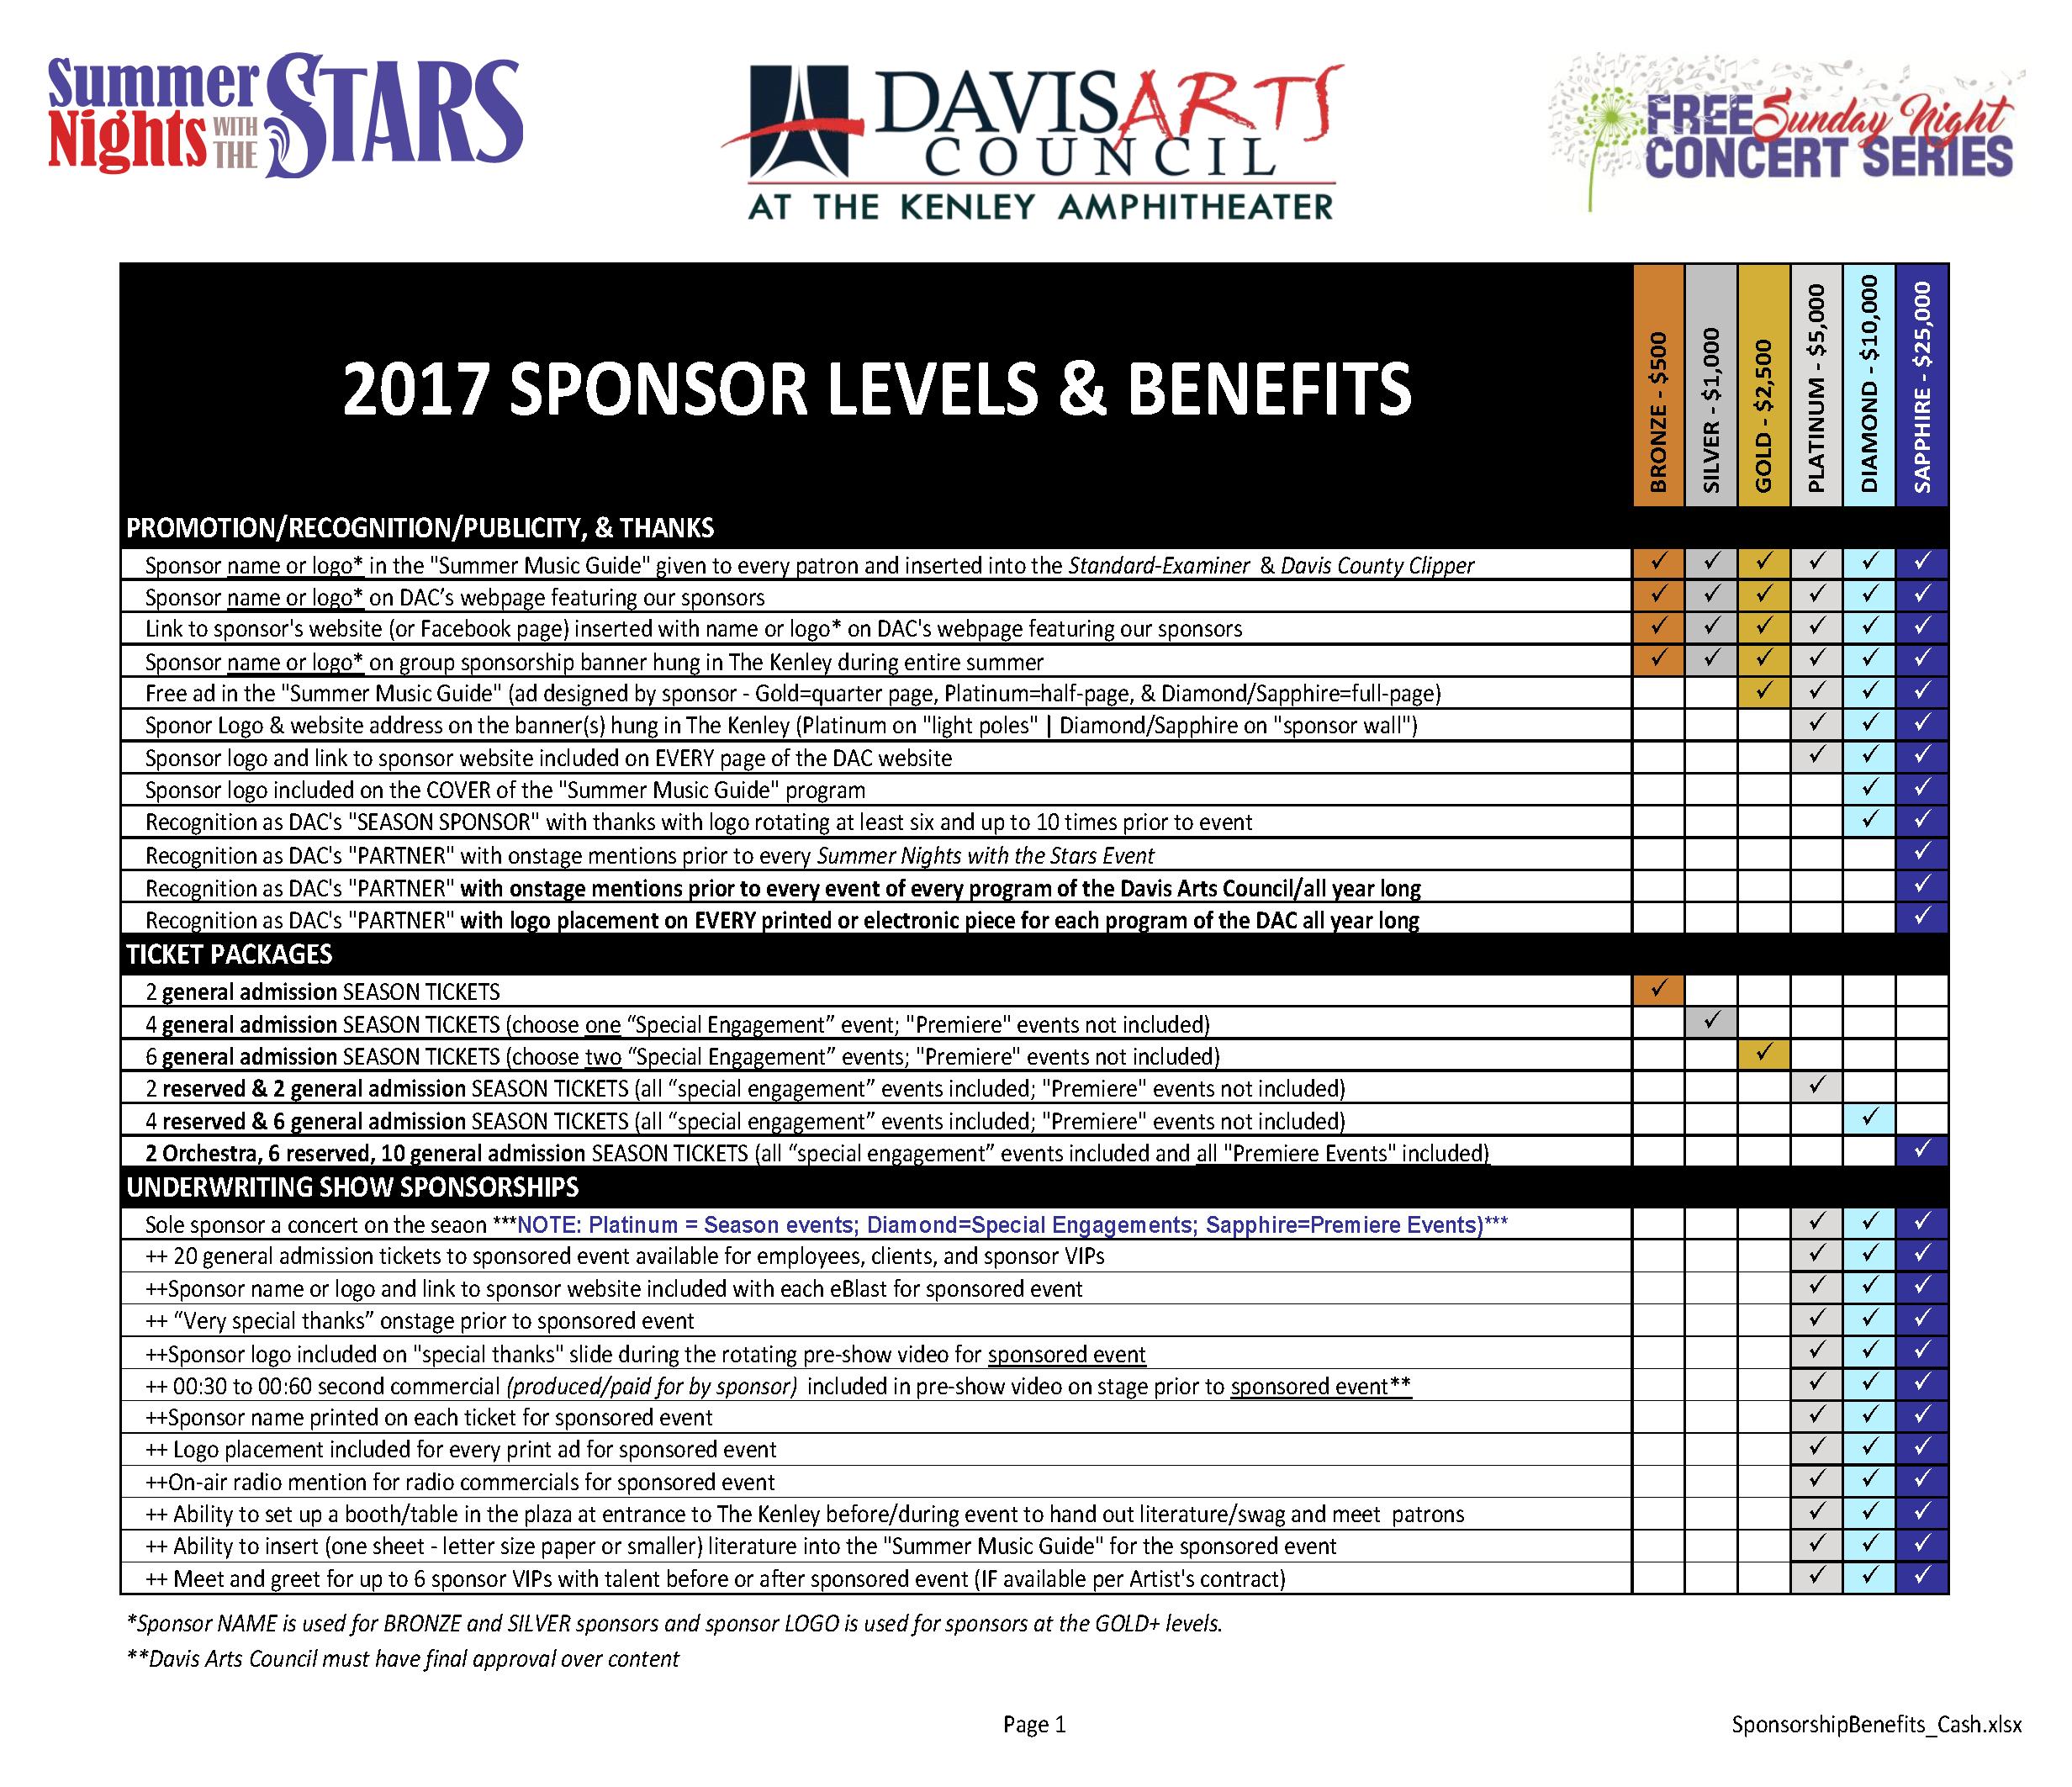 2017 Sponsorship Benefits